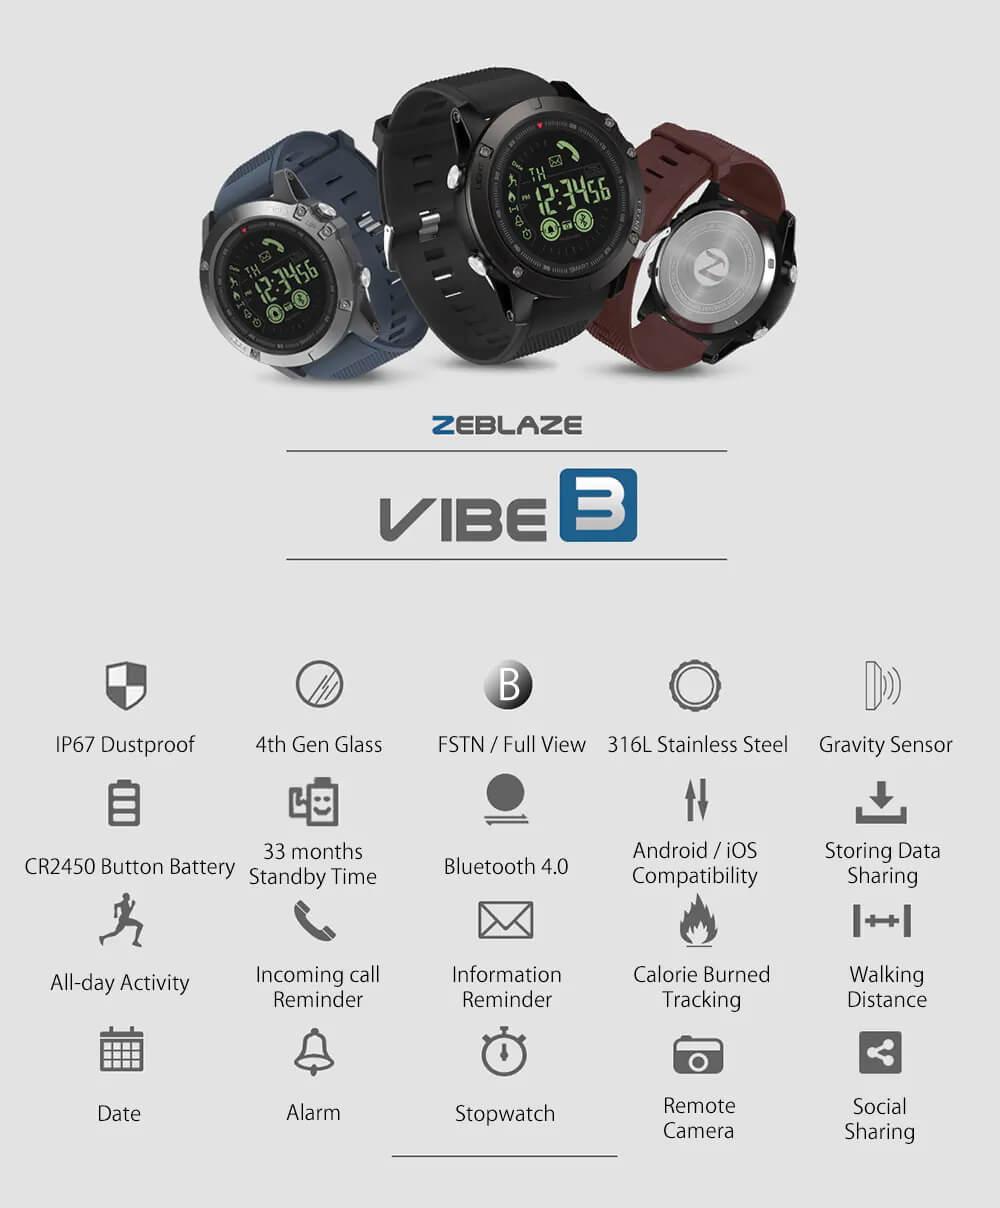 Zeblaze VIBE 3 Sports Smartwatch.jpg